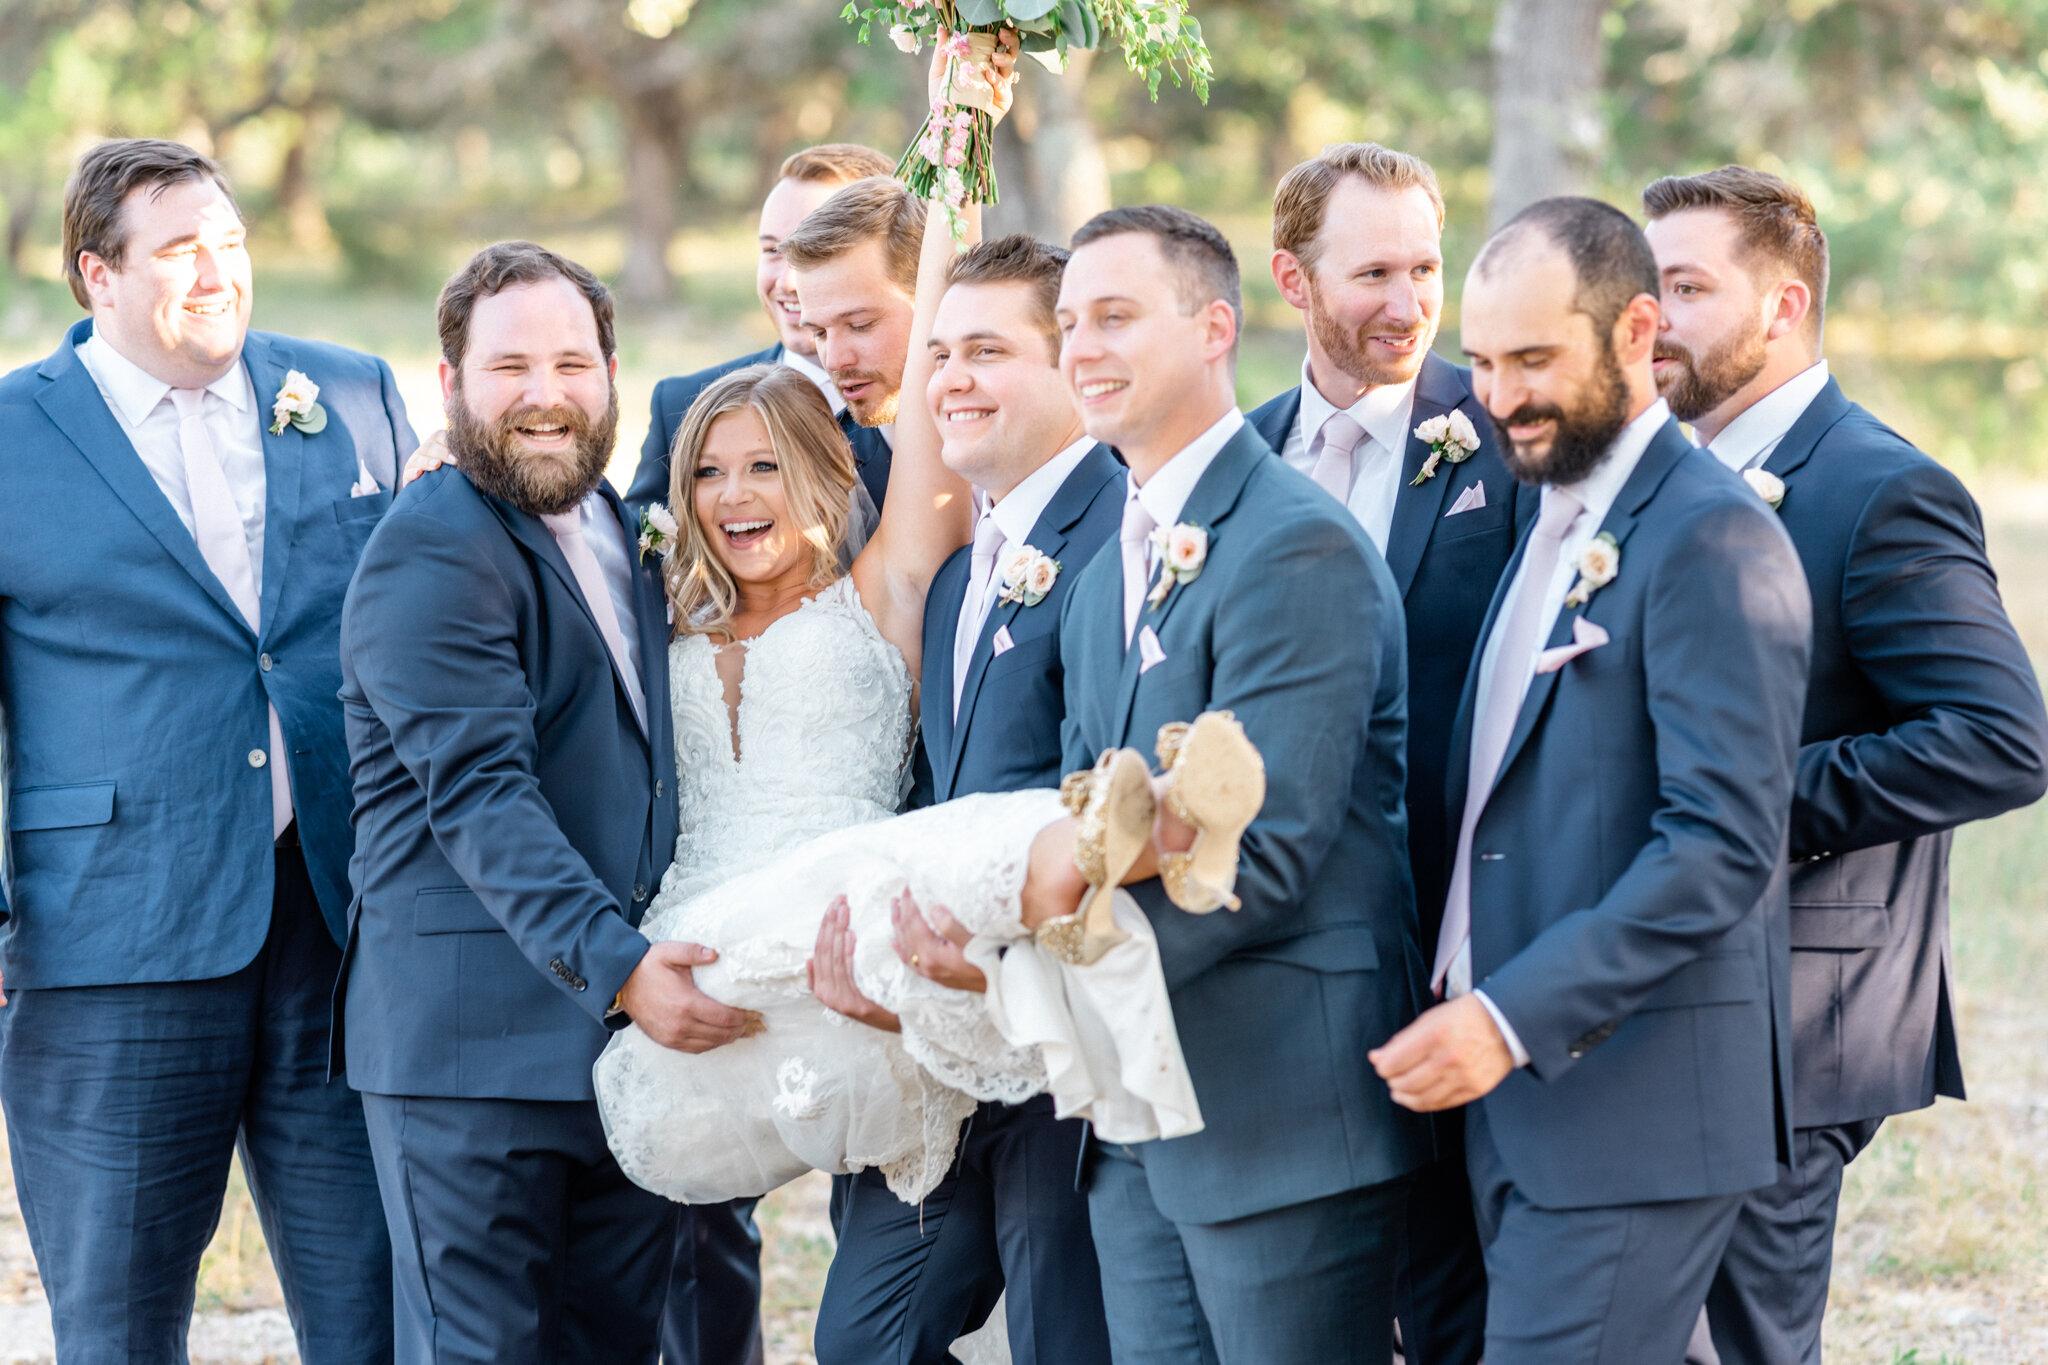 San Antonio Austin Boerne New Braunfels Spring Branch Texas Wedding Engagement Photographer Photography Hill Country Texas Park 31 Wedding Summer Wedding Pink Navy Gold Elegant Chic Wedding San Antonio Austin Texas photographer 73